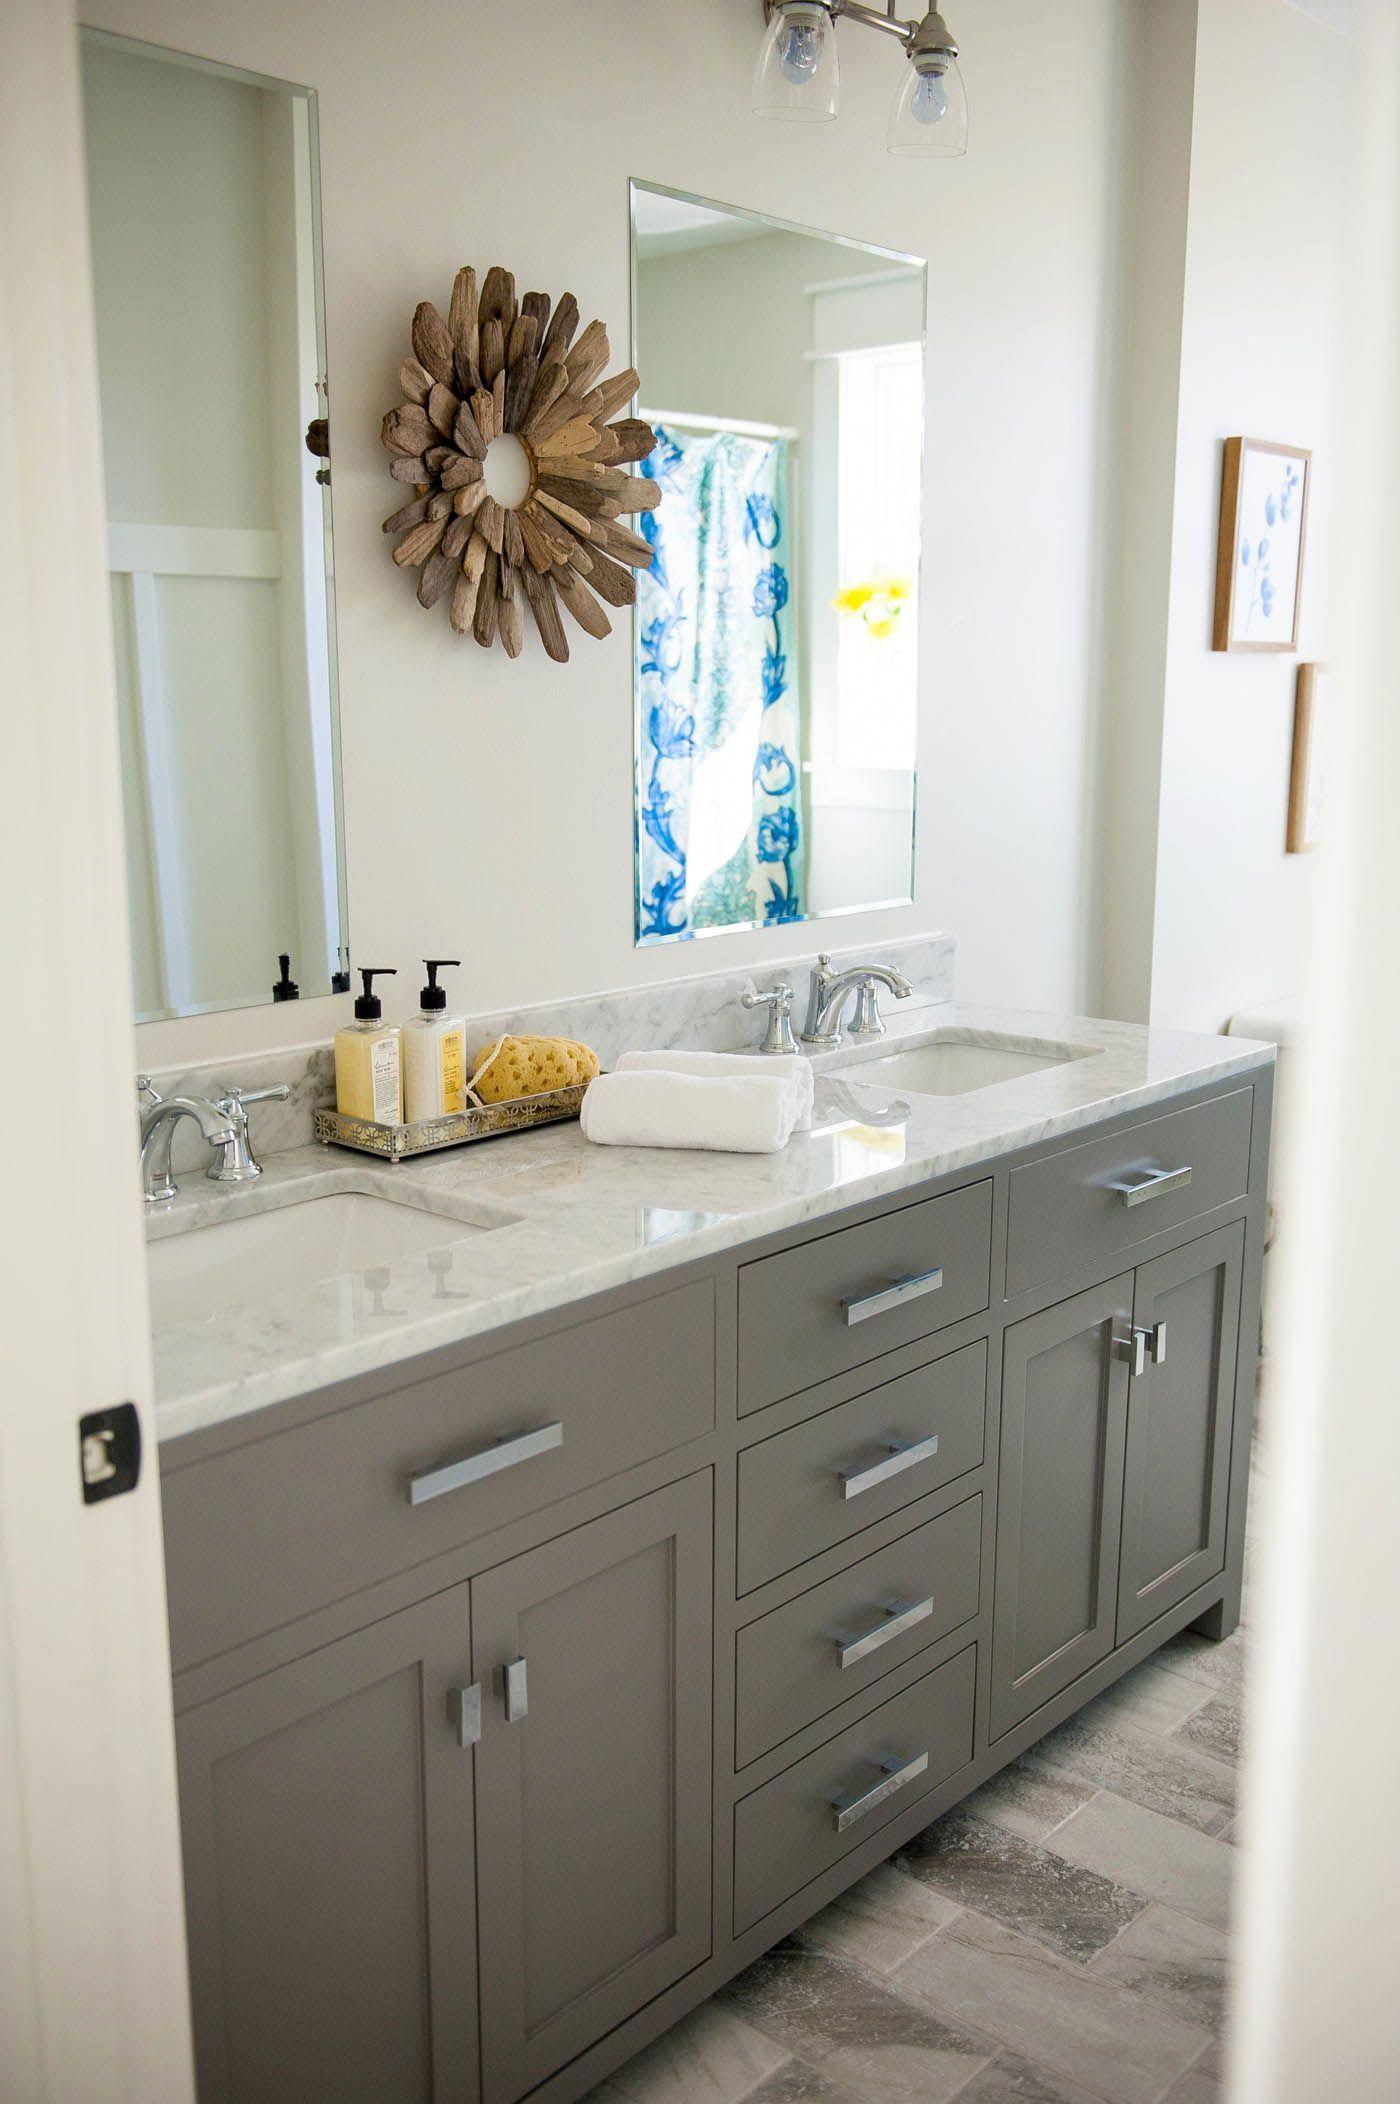 I Have Never Noticed Doing This Before Decorating Ideas Bathroom Double Vanity Bathroom Sink Remodel Grey Bathroom Vanity